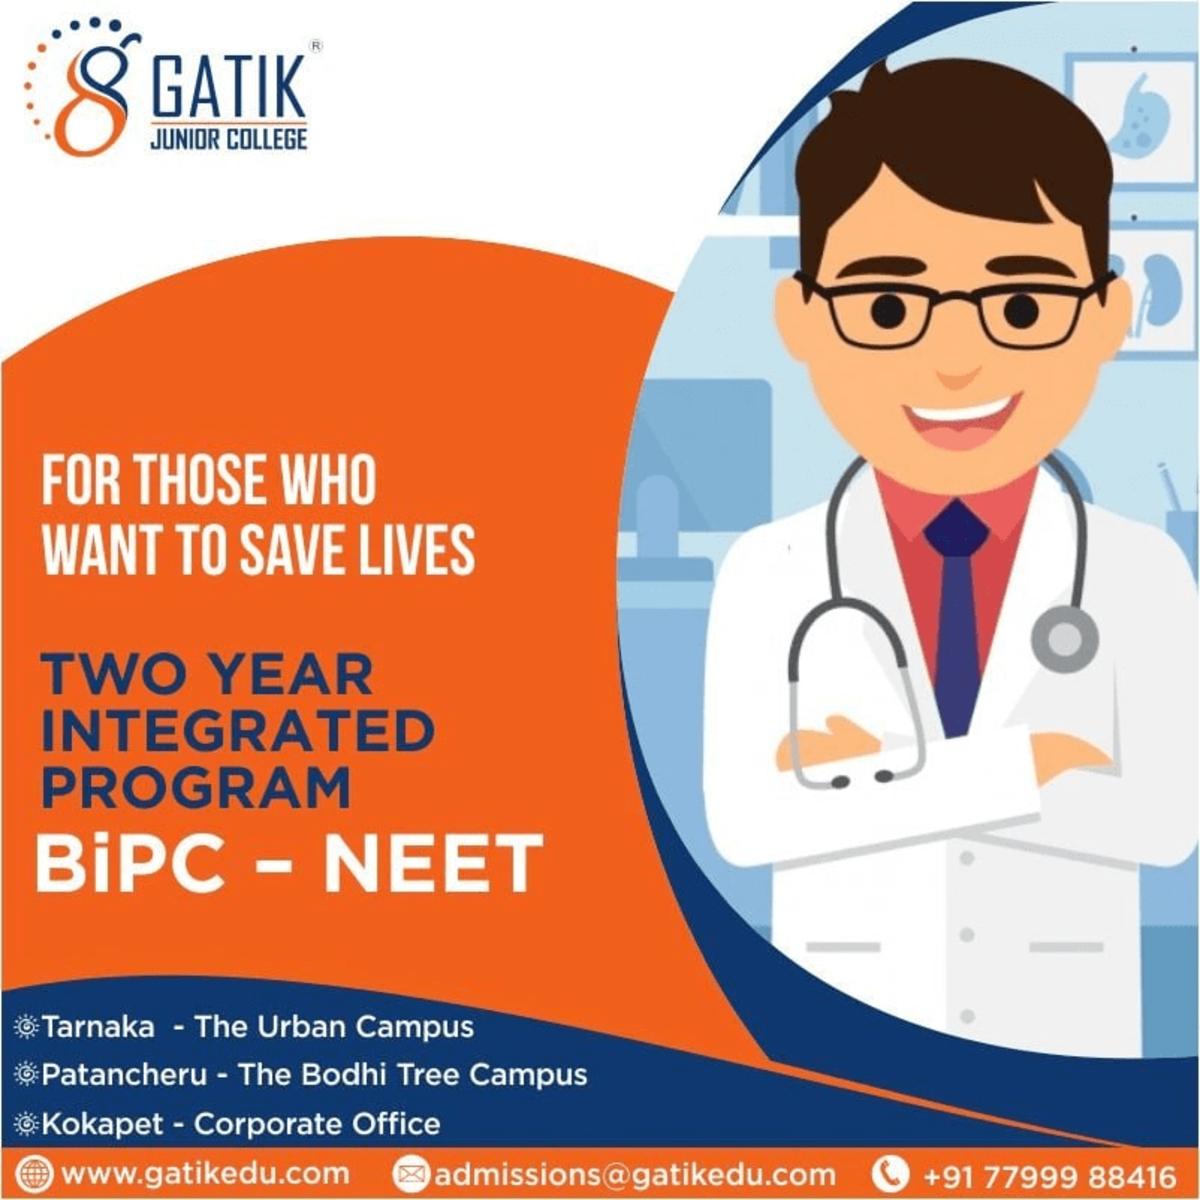 best-intermediate-colleges-in-hyderabad-for-bipc-gatik-junior-college